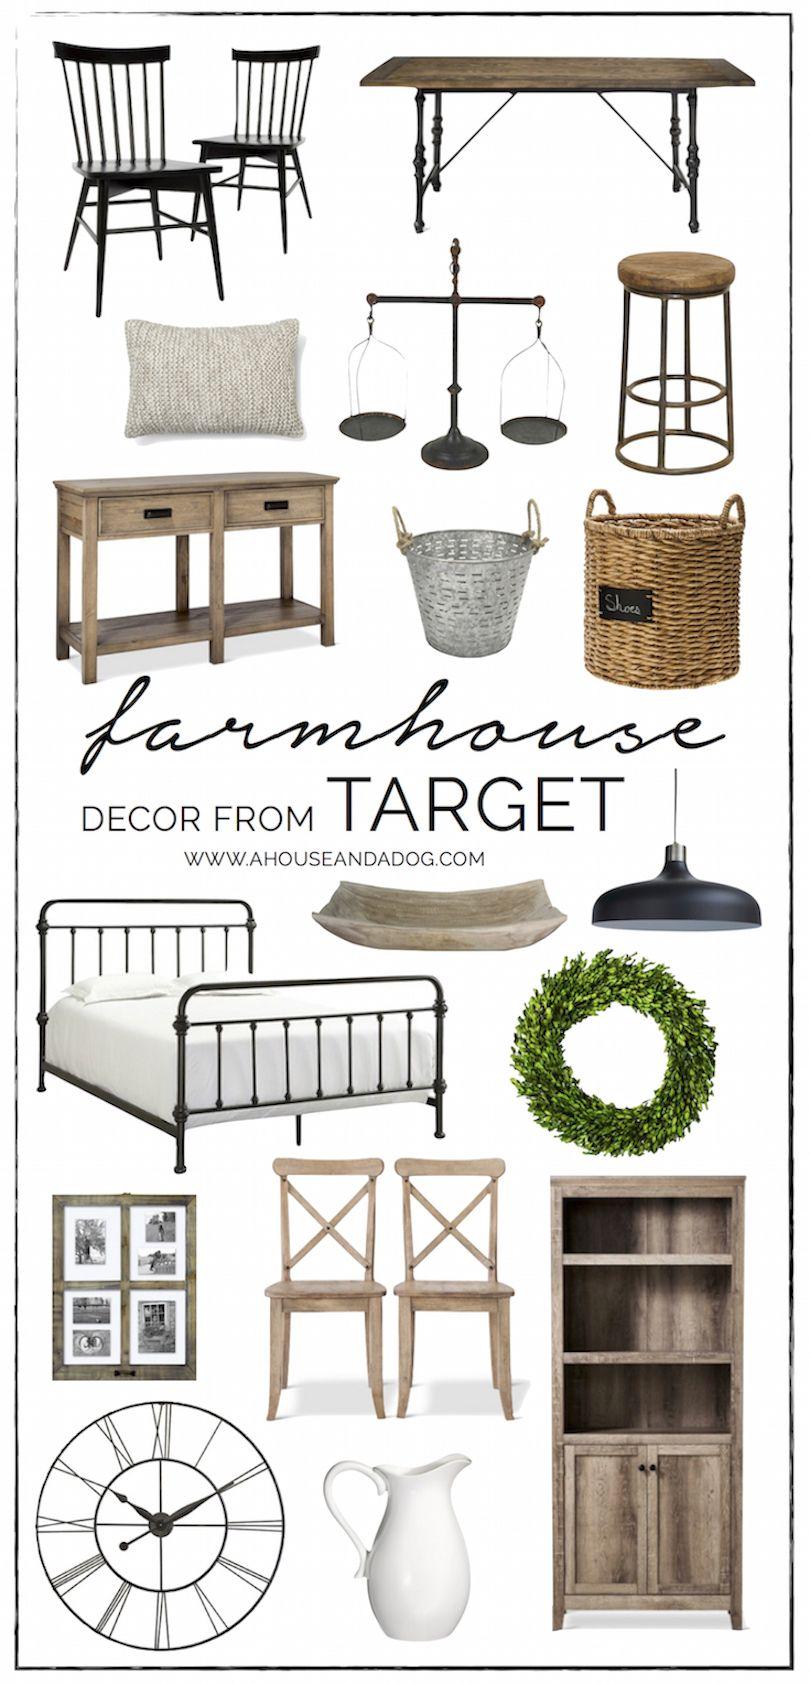 Farmhouse decor at target a house and a dog home decor